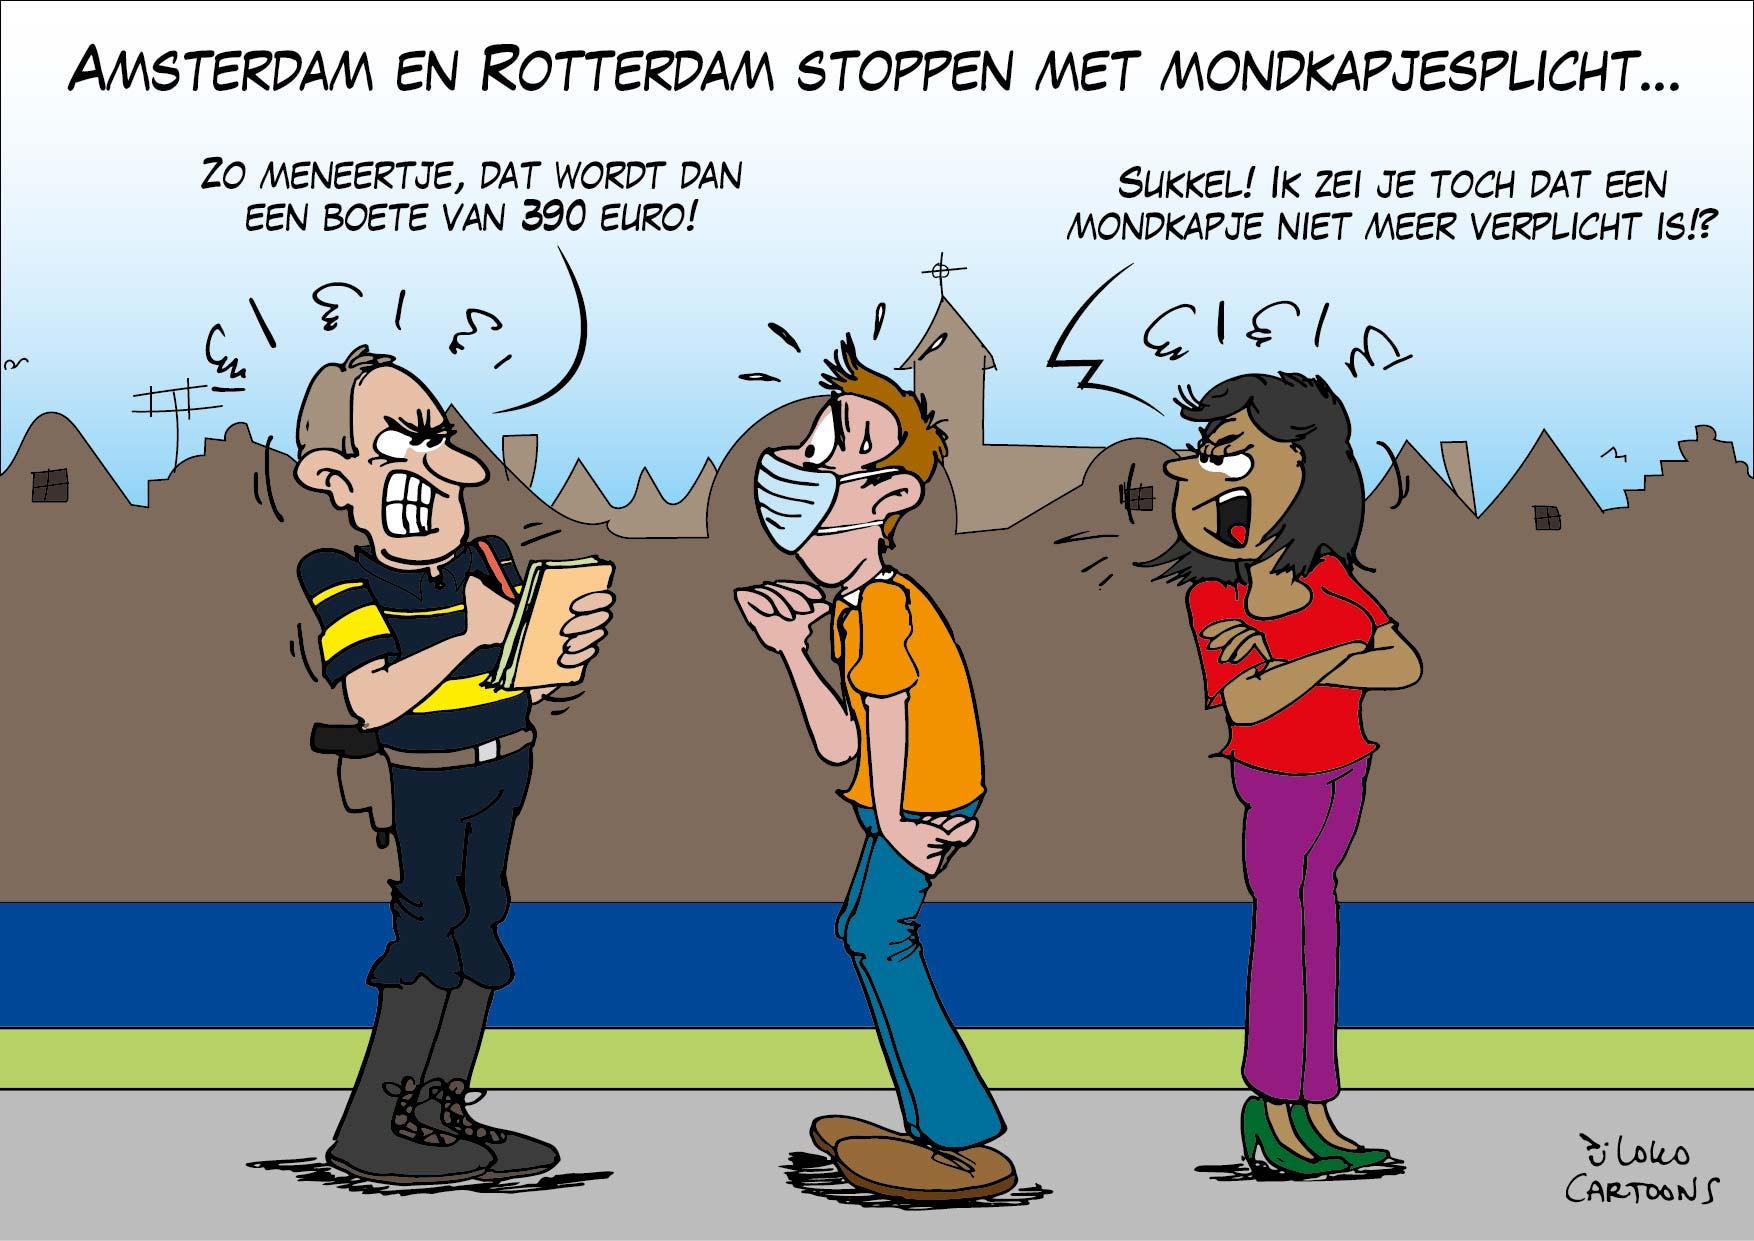 Amsterdam en Rotterdam stoppen met mondkapjesplicht…